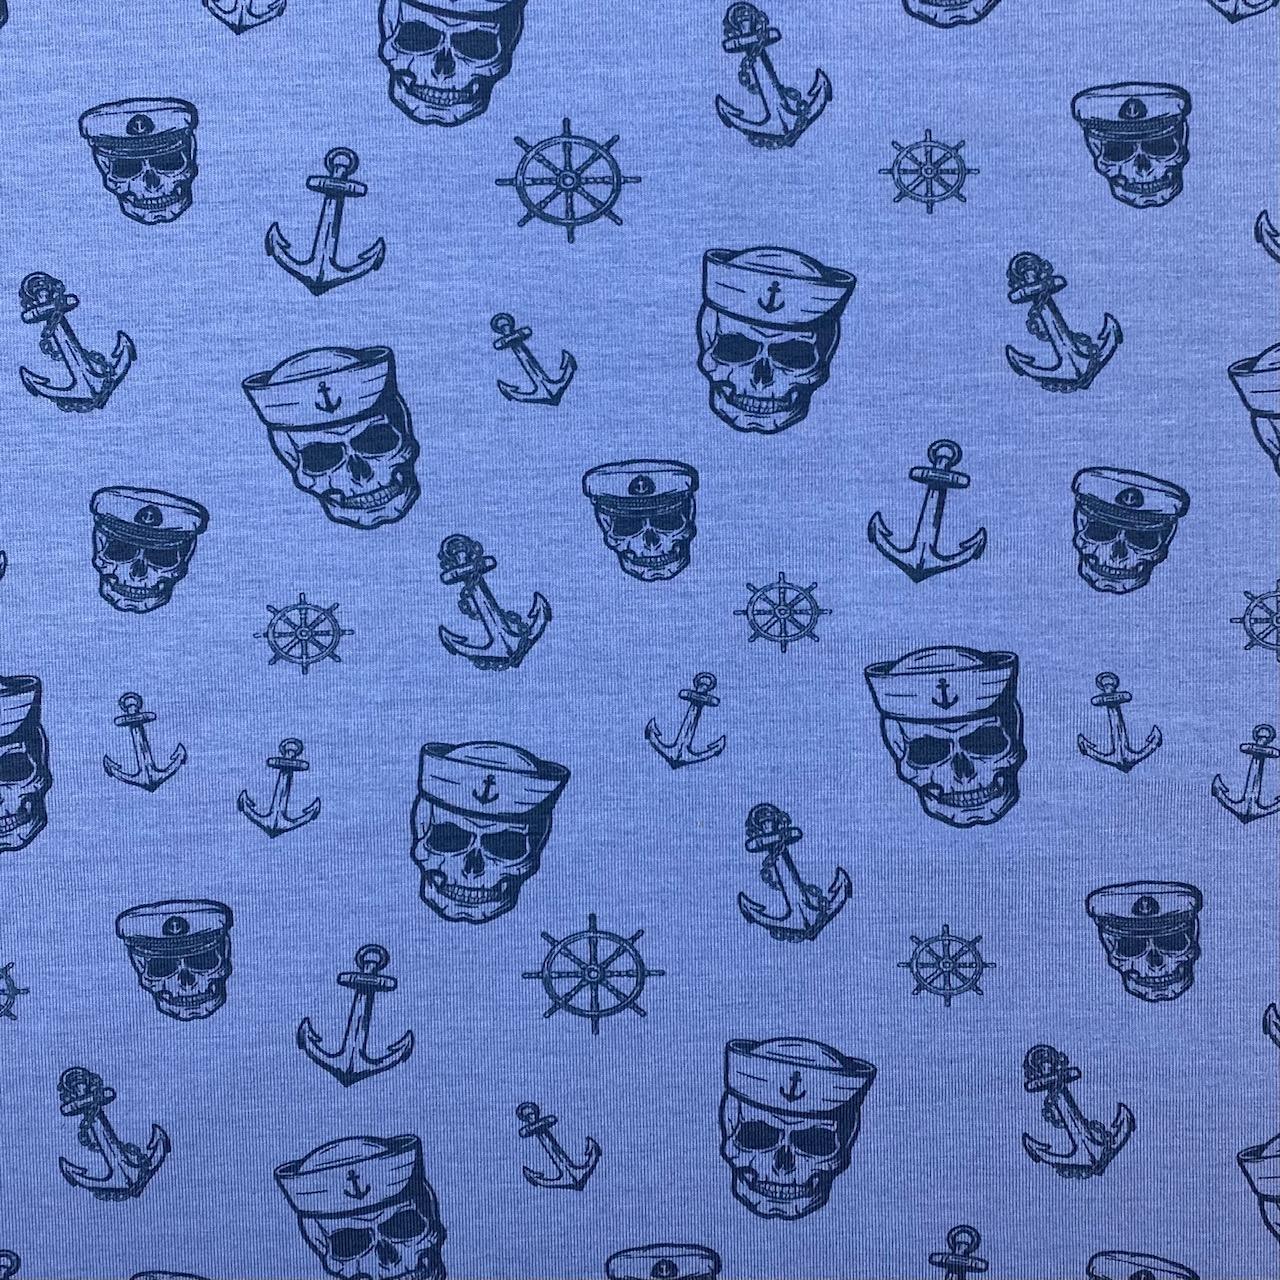 Baumwolljersey, Piraten, jeansblau.  Art. 4830/1101